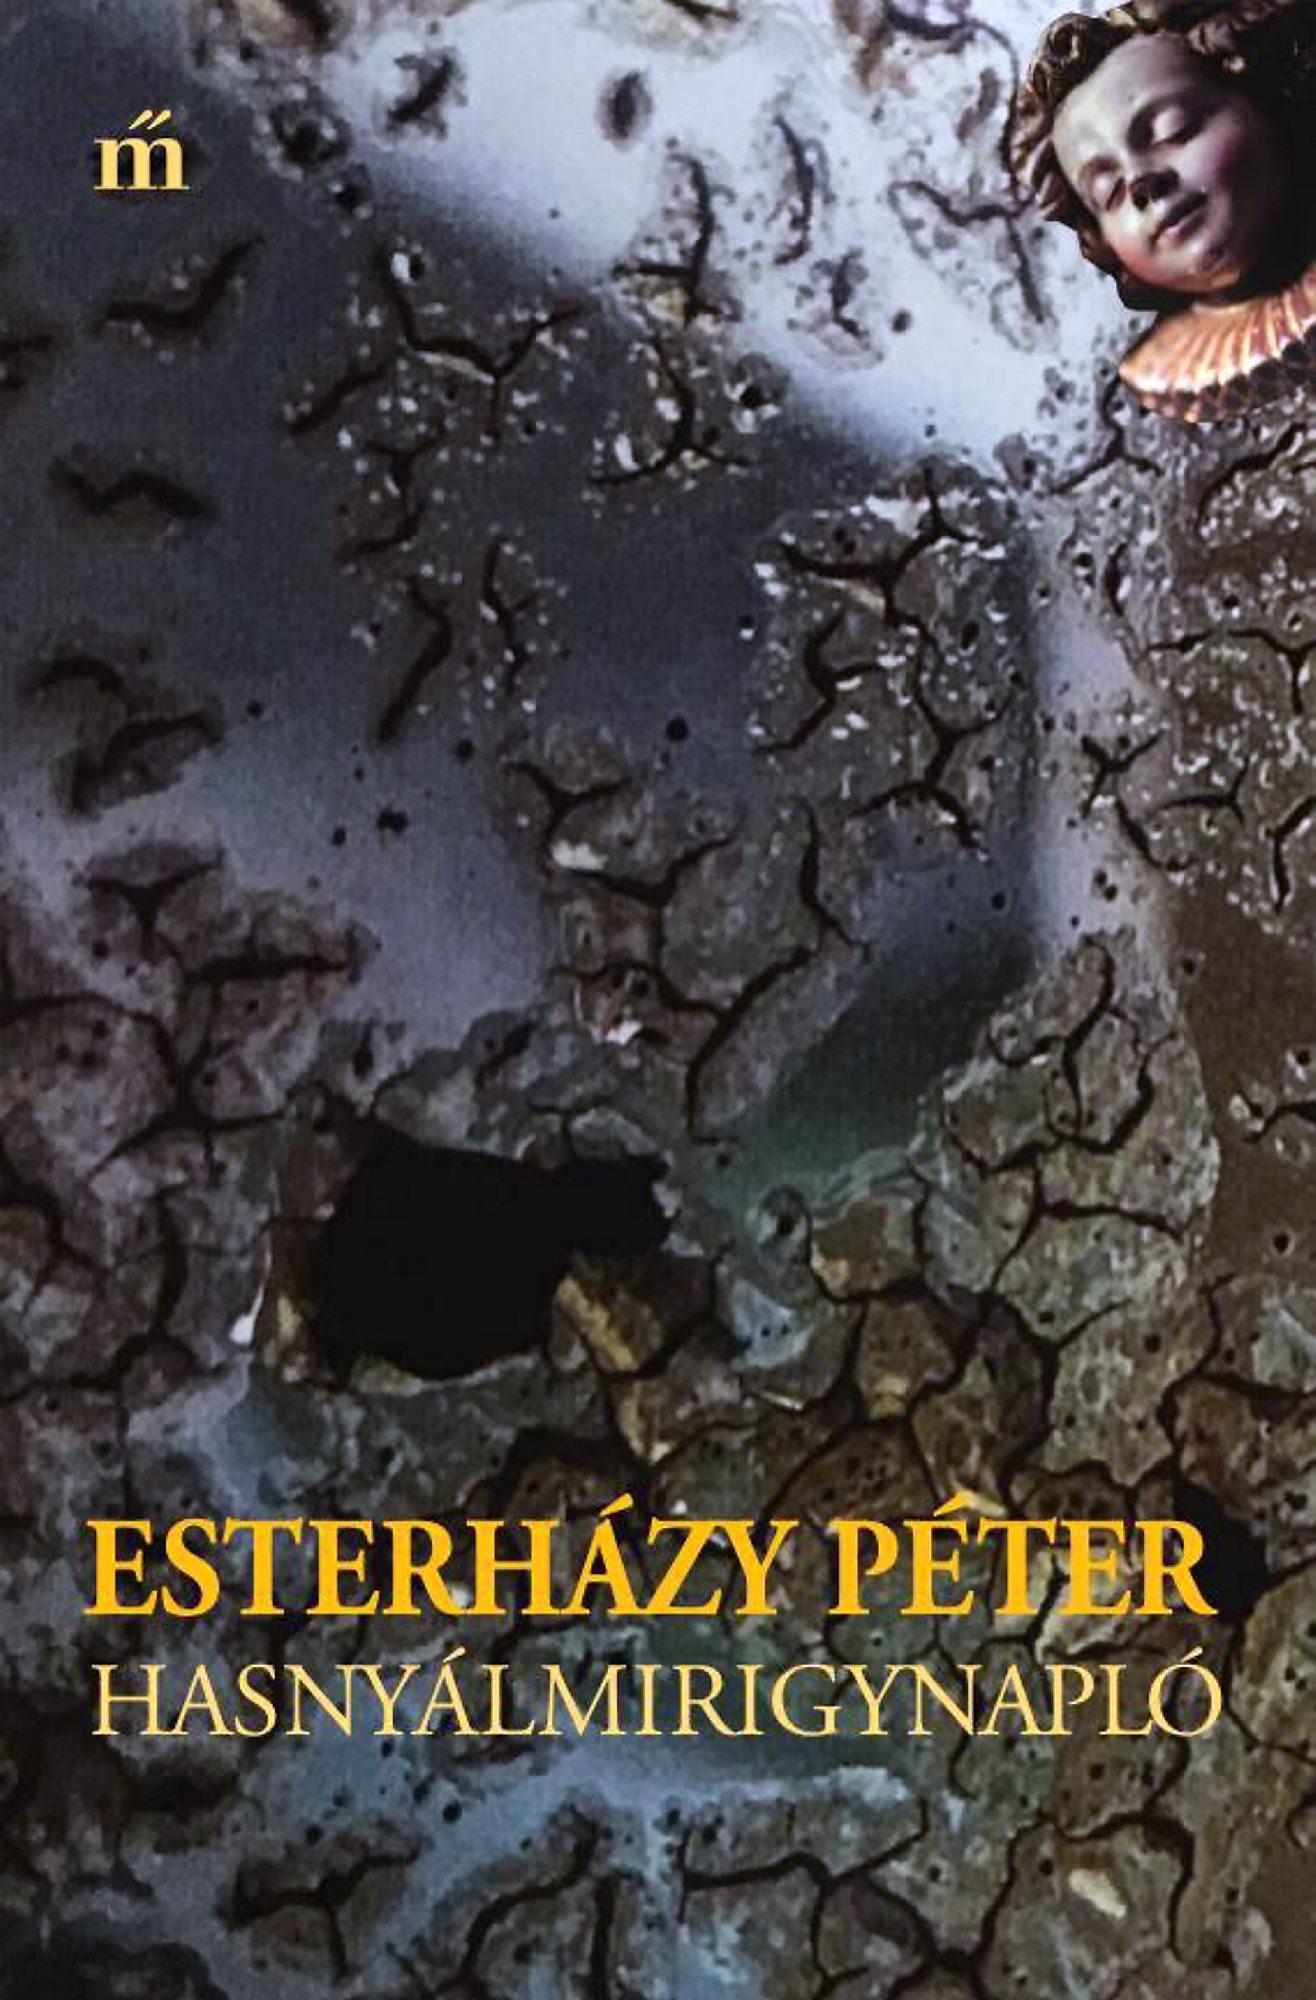 MNO_kf_Esterhazy_Peter_Hasnyalmirigynaplo